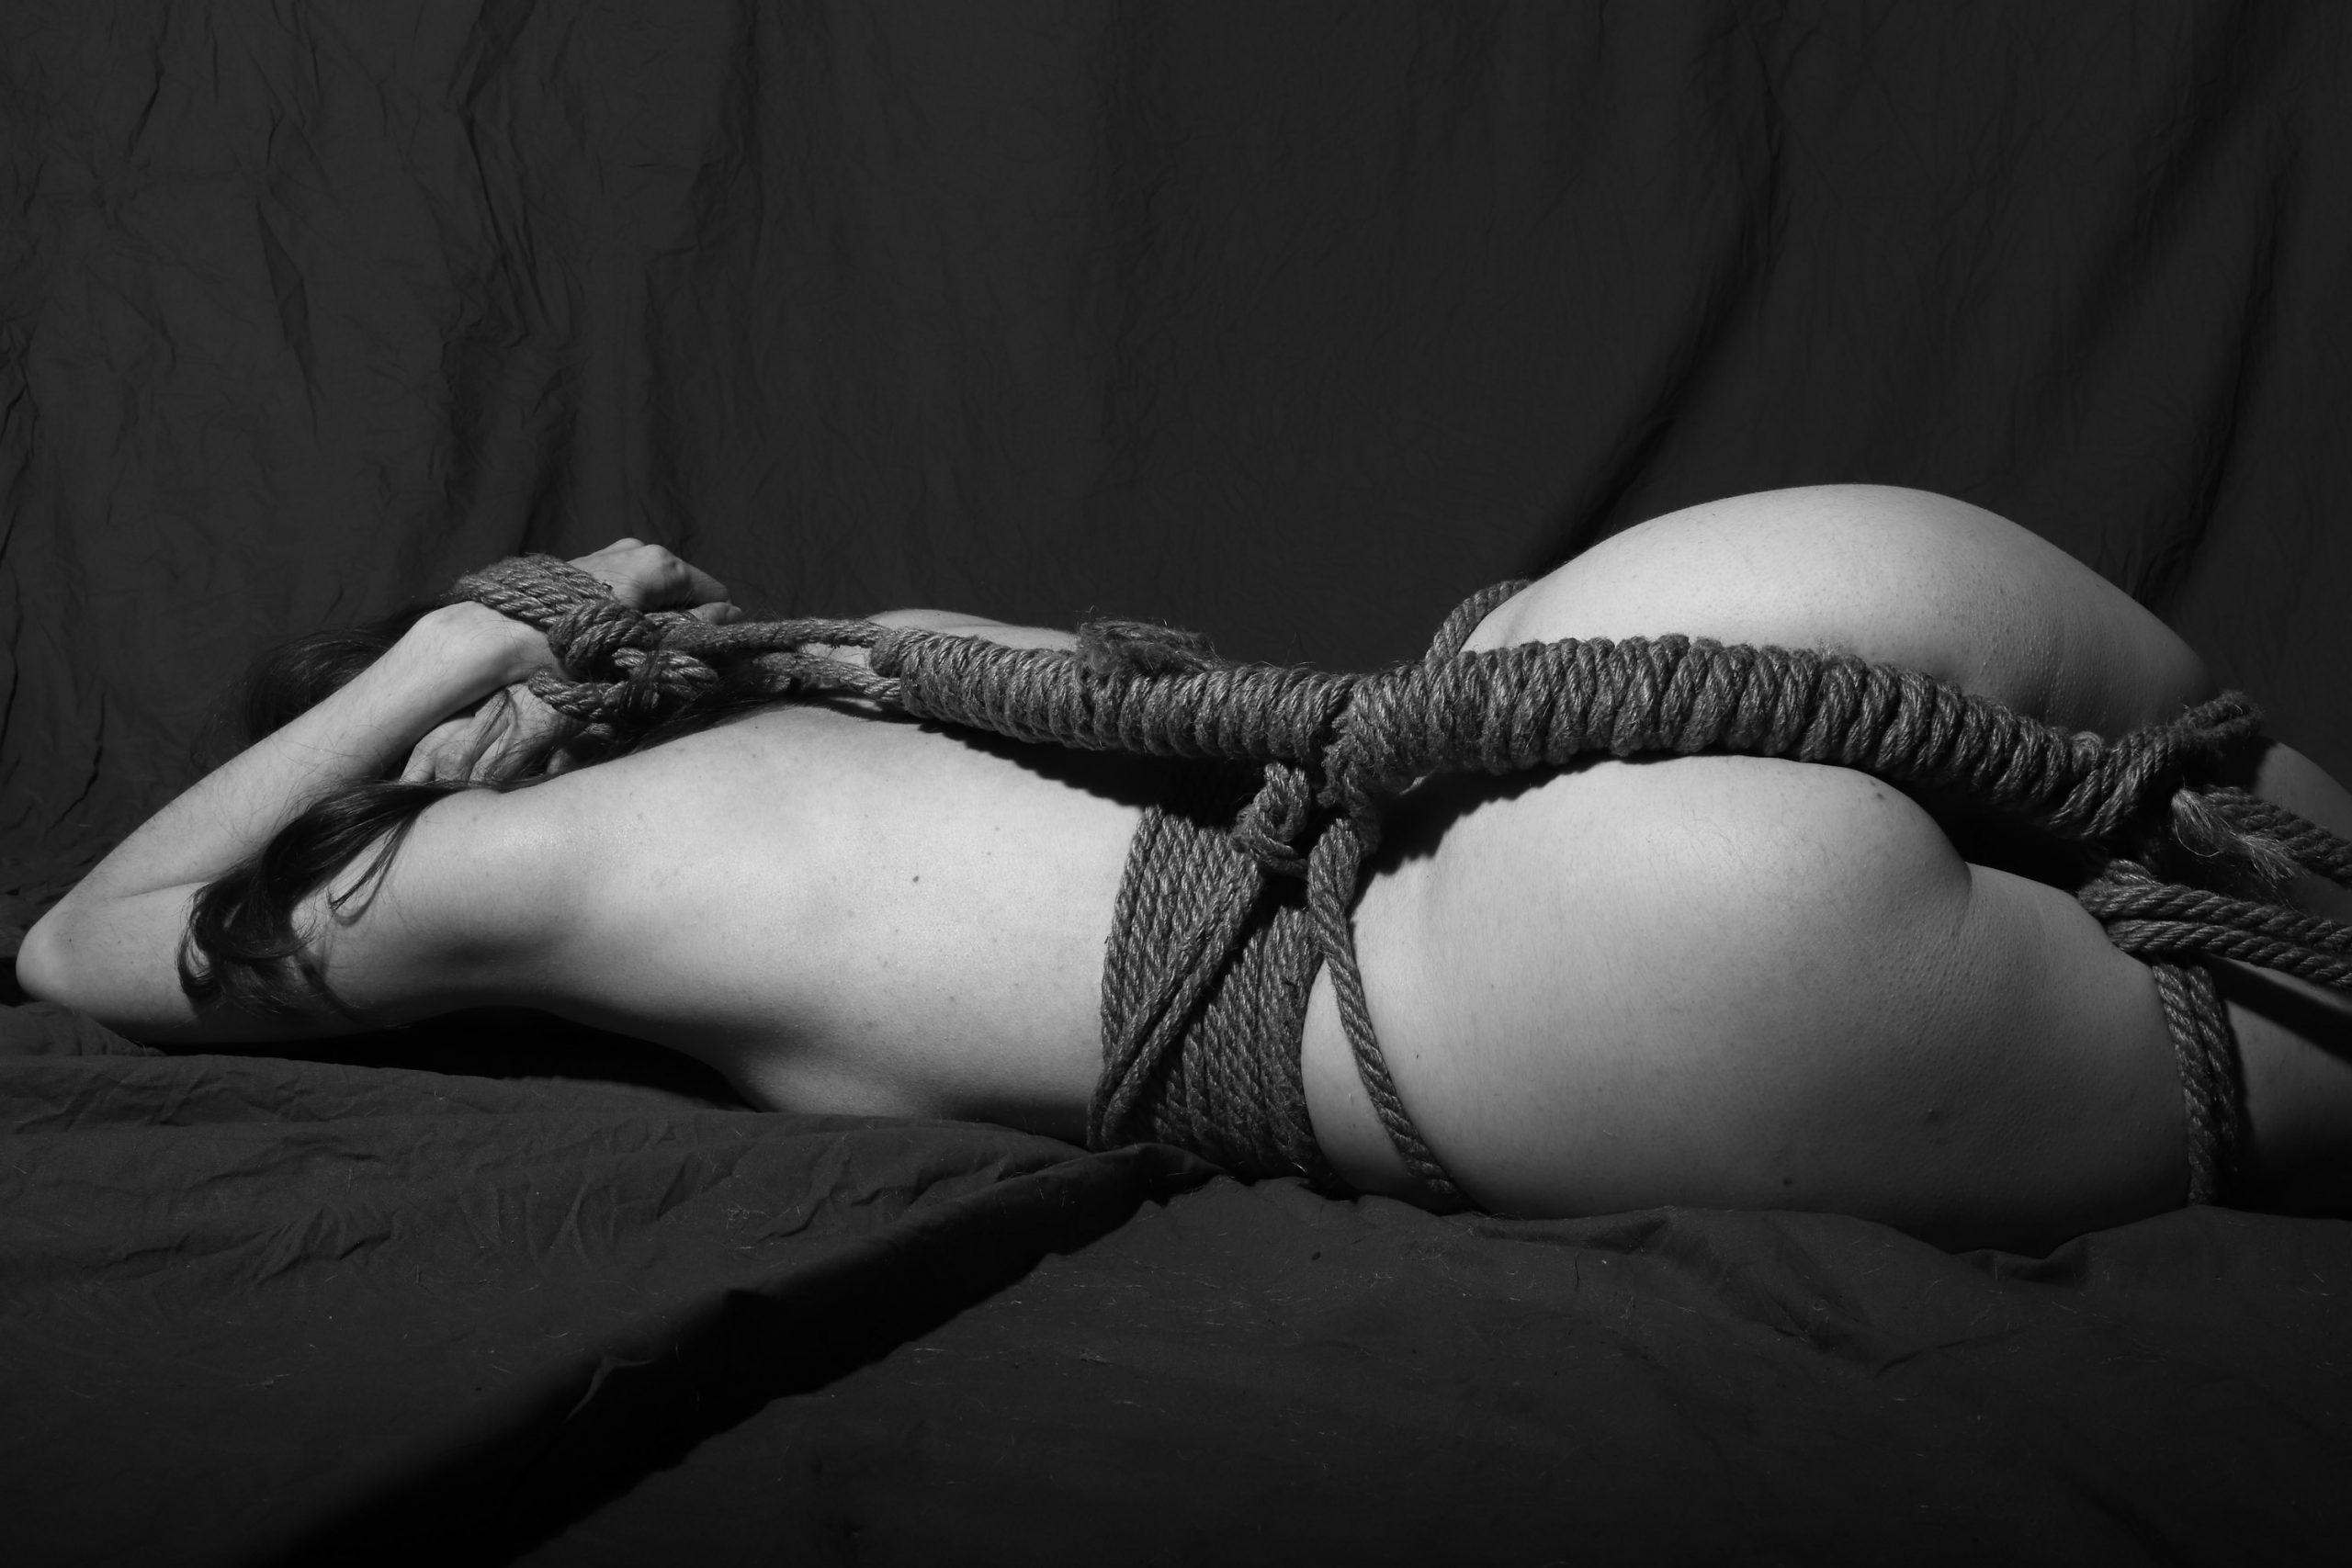 Categoria: Boudoir & Nude; Photographer: DANIELE FORNER; Model: ABBY LOLITA; Location: Treviso (TV)